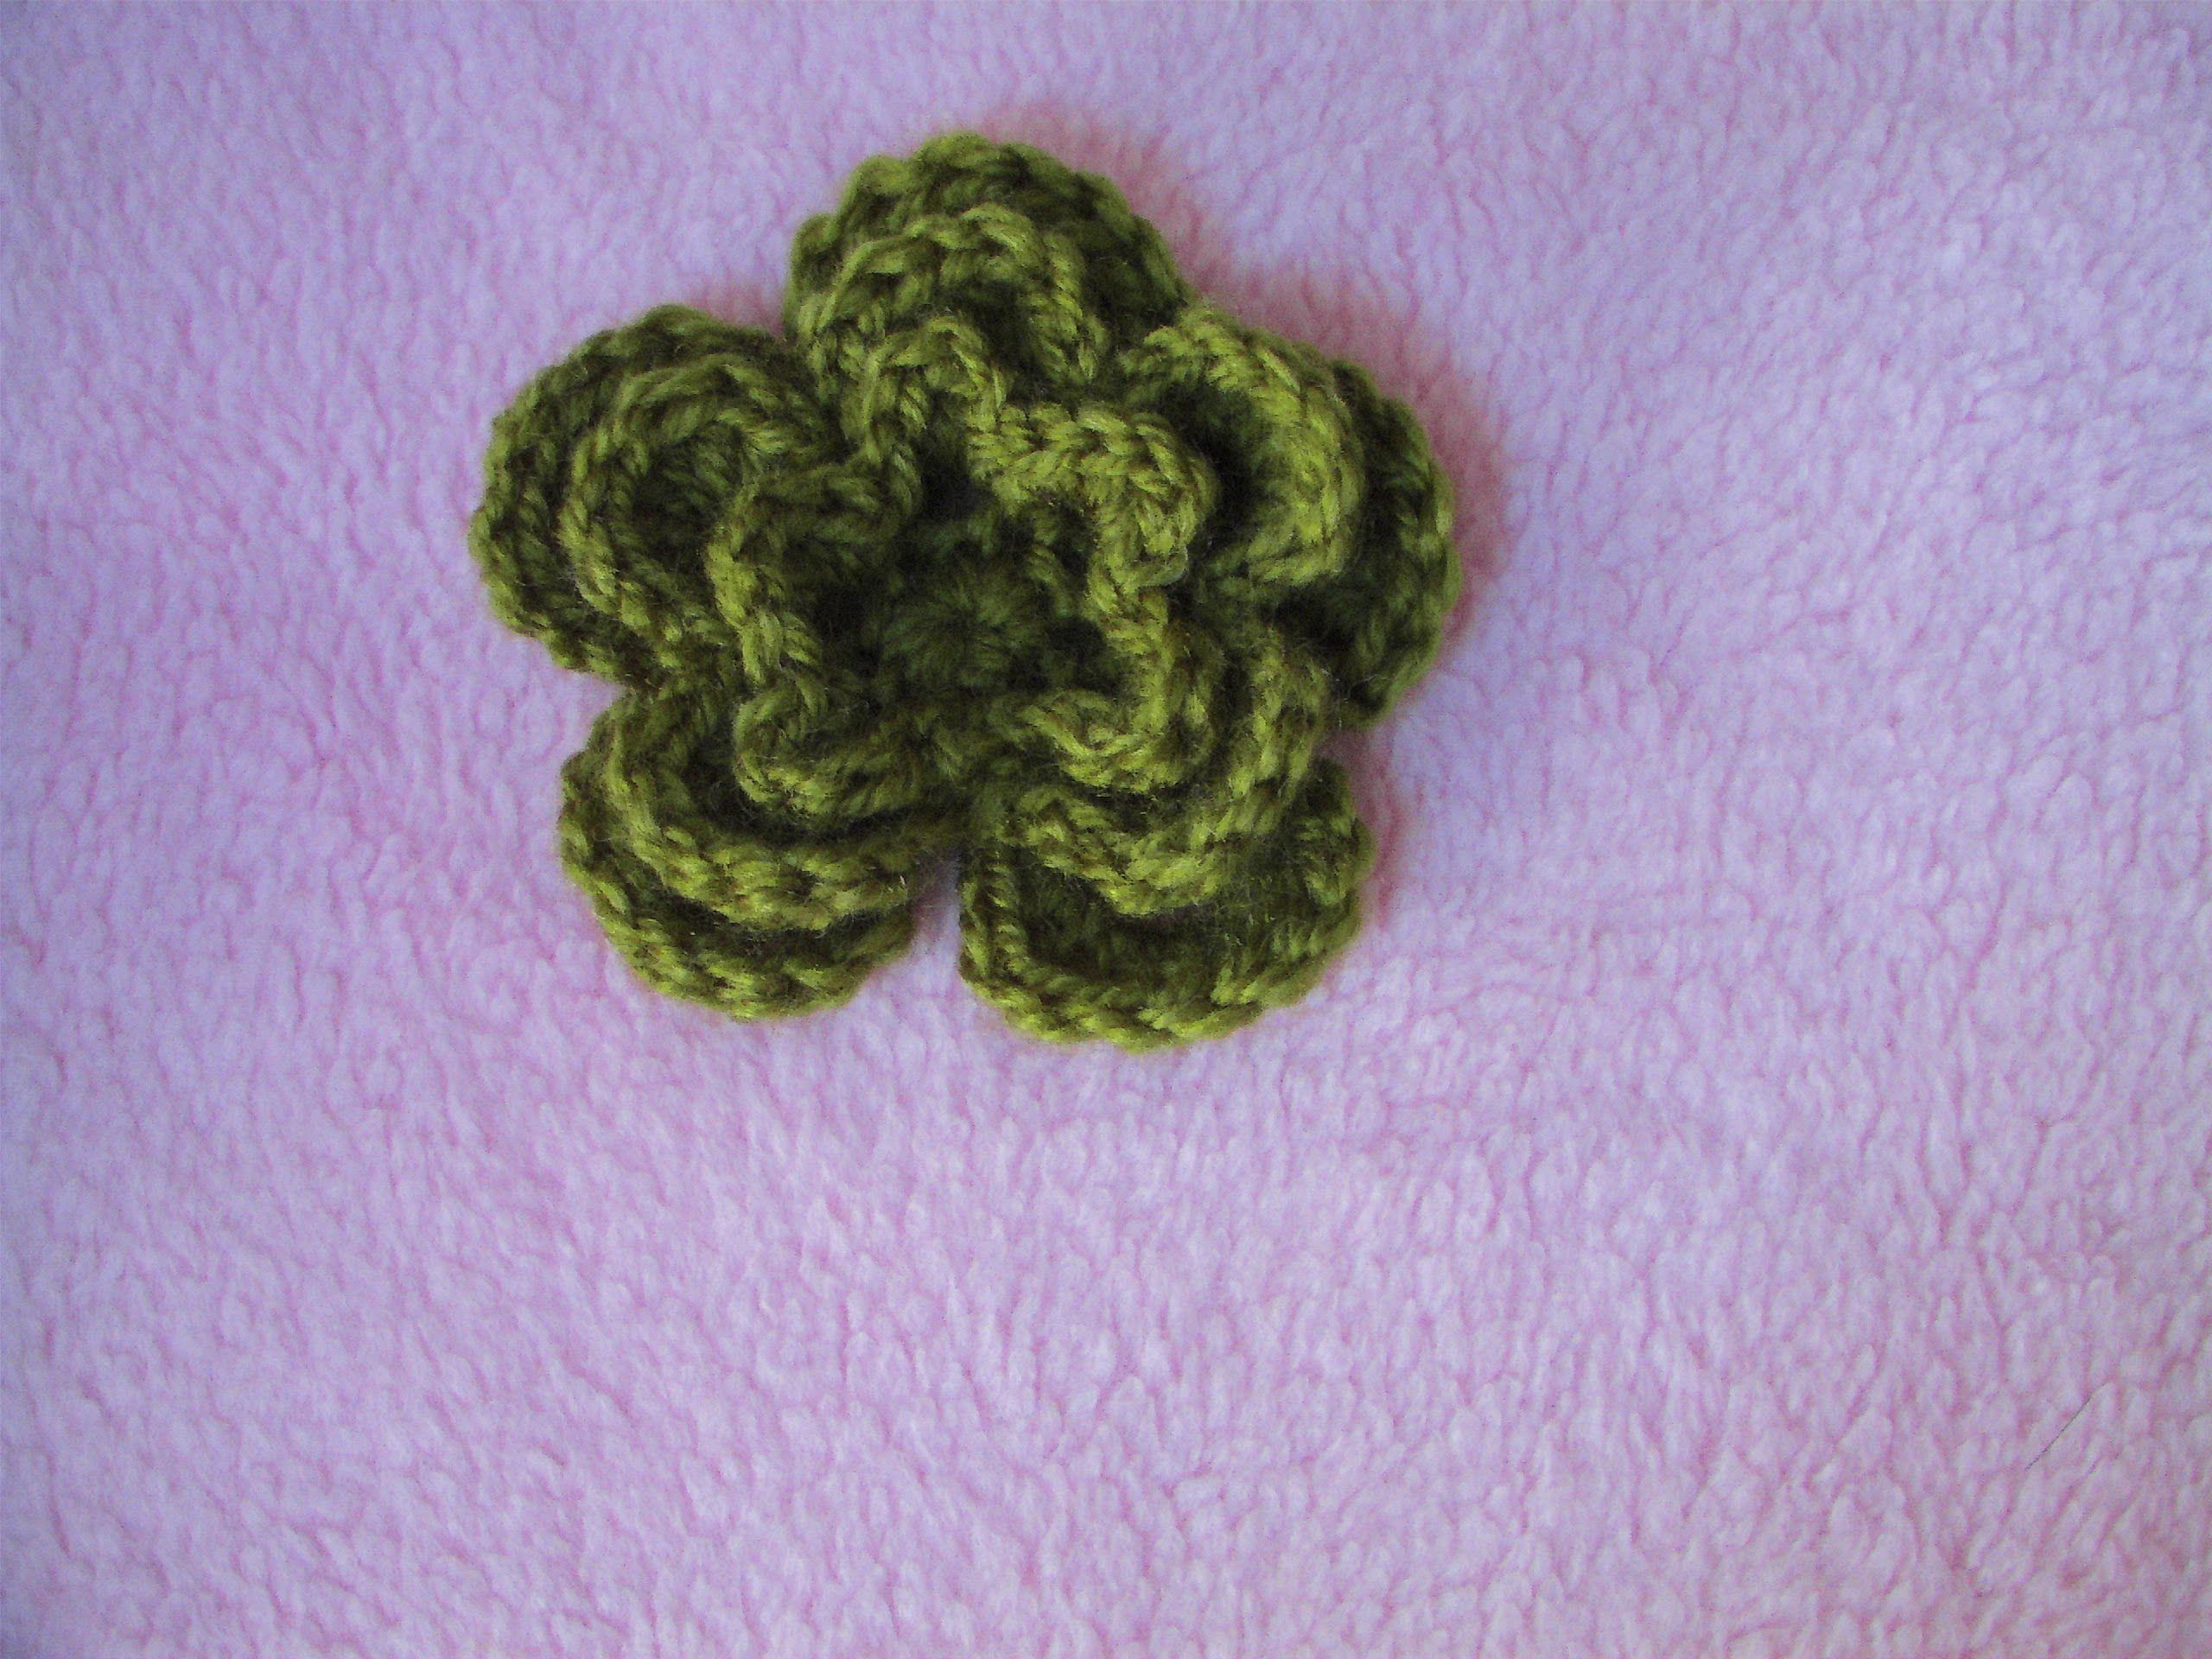 Amigurumi Flower Tutorial : Πλεκτο Λουλουδι σε Τρια Επιπεδα crochet layer flower tutorial